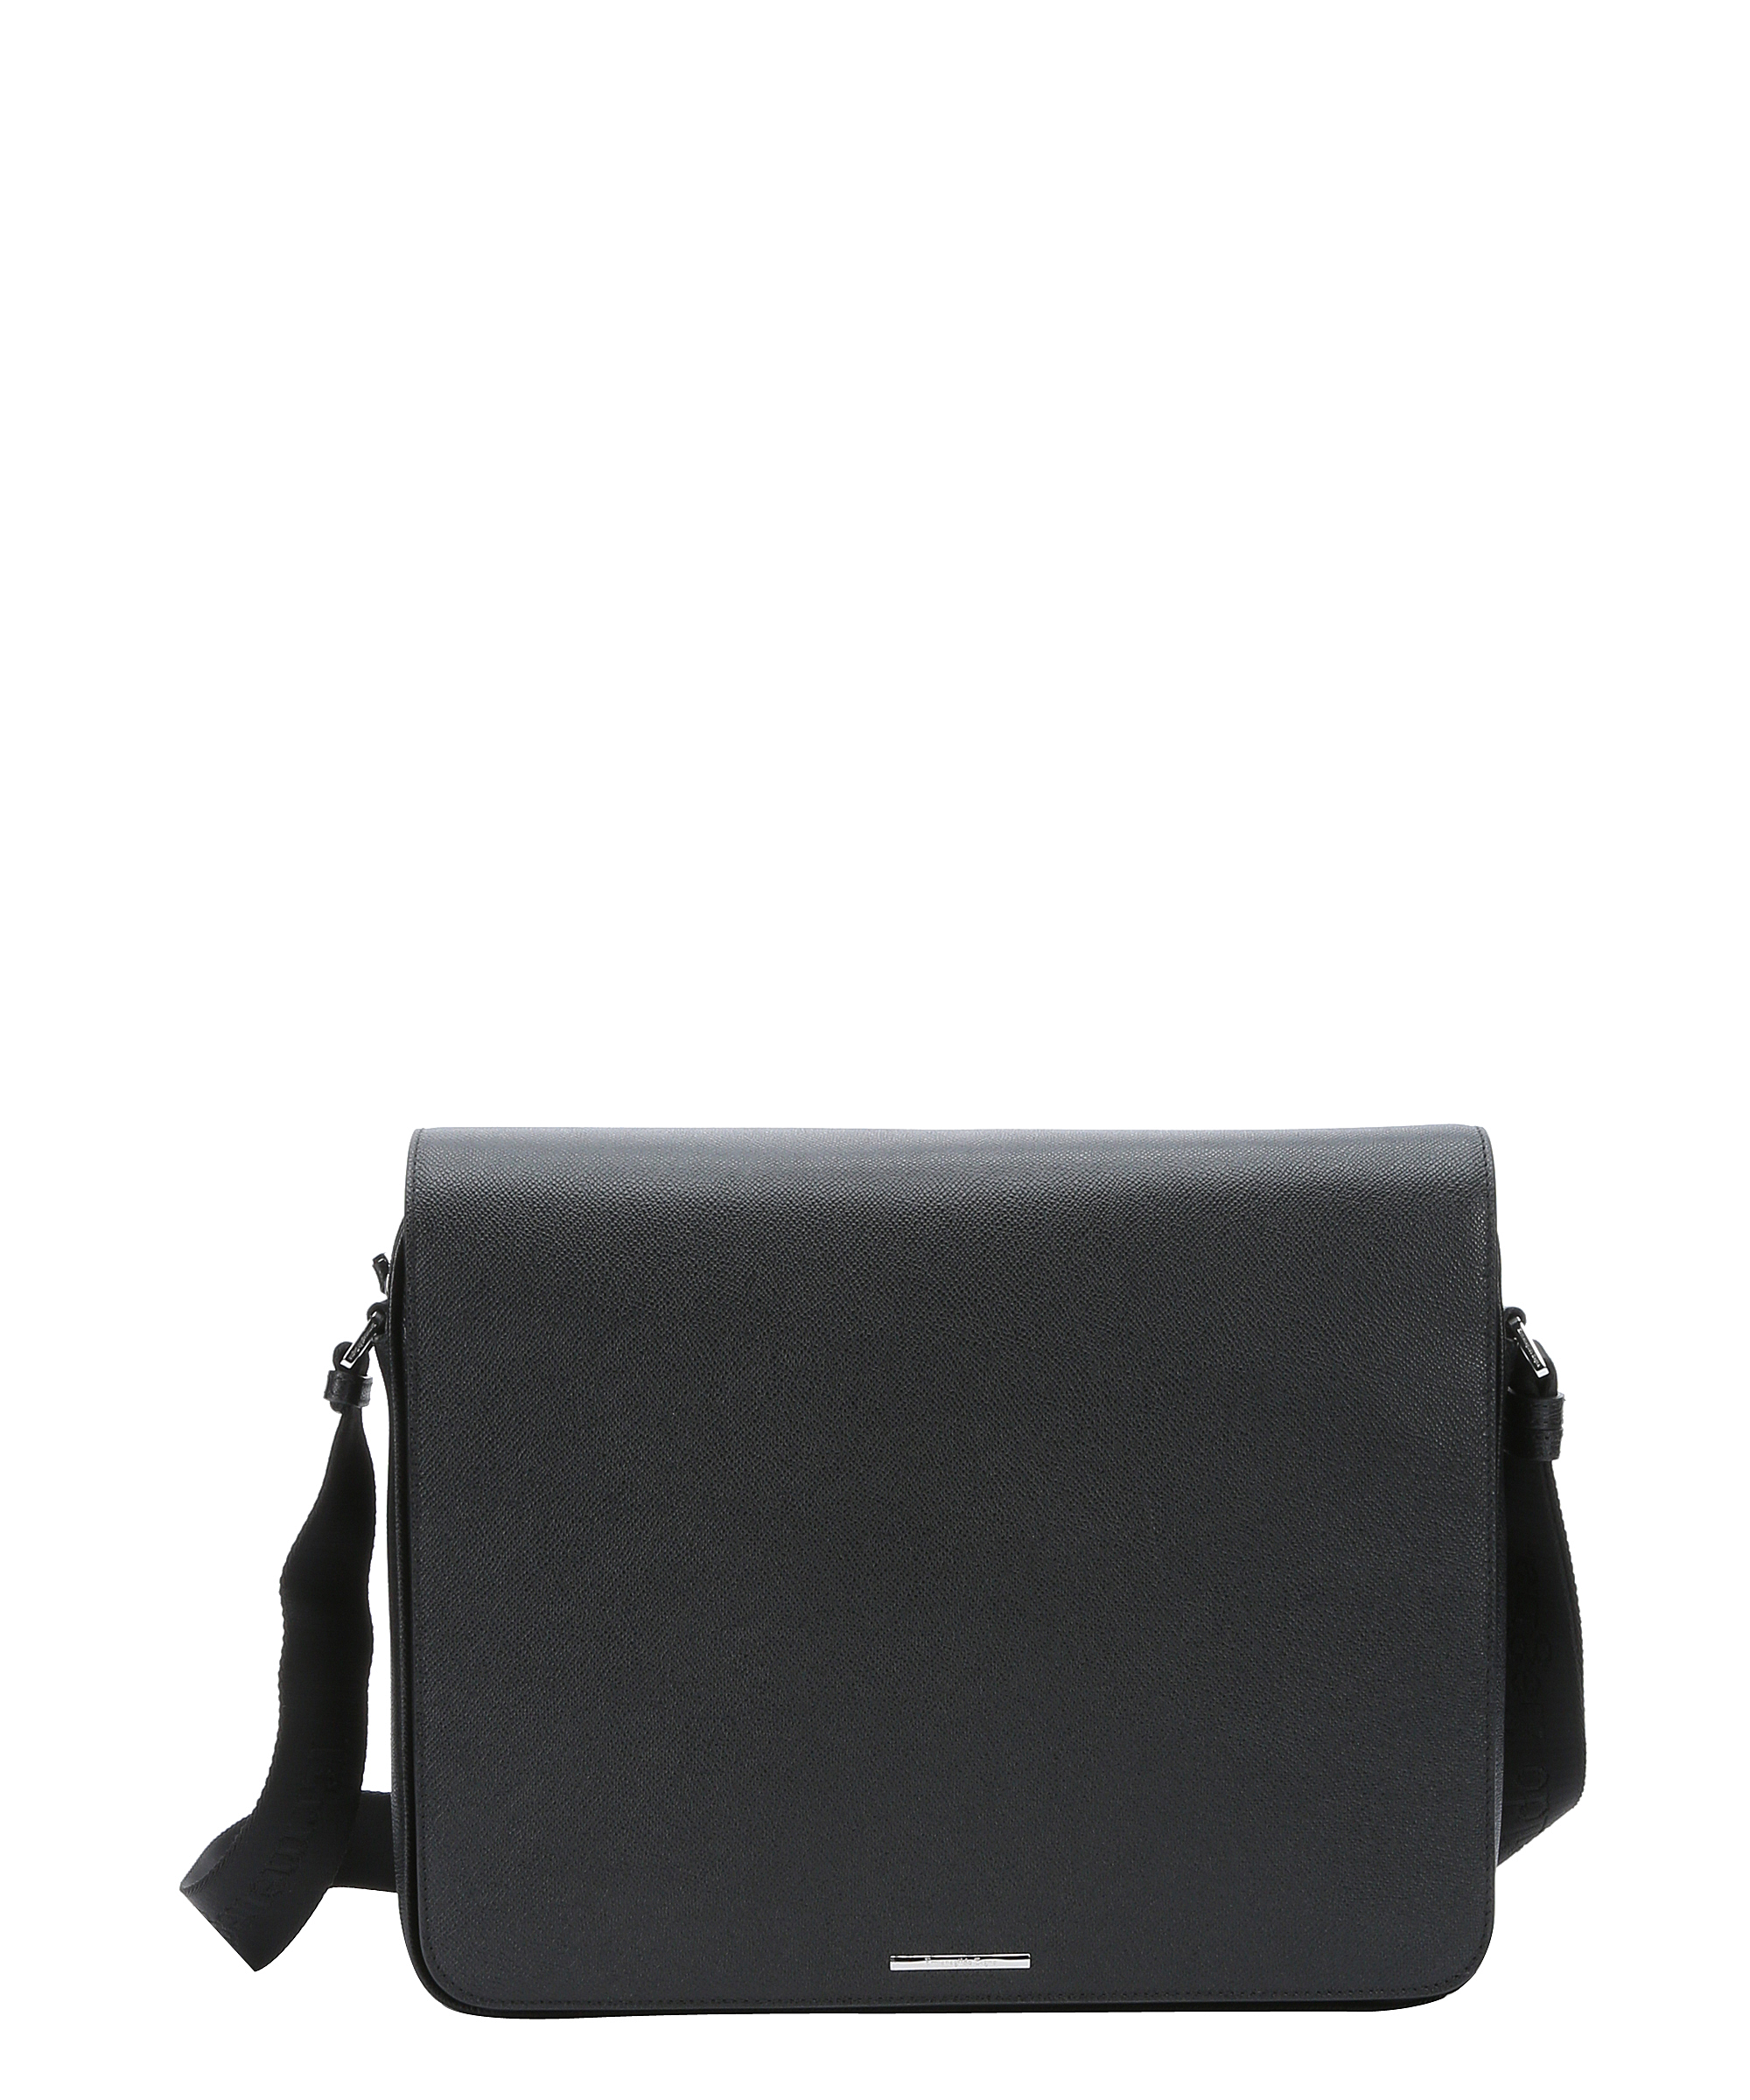 f8baa6c5fda3 Ermenegildo Zegna black leather messenger bag | zegna | Black ...